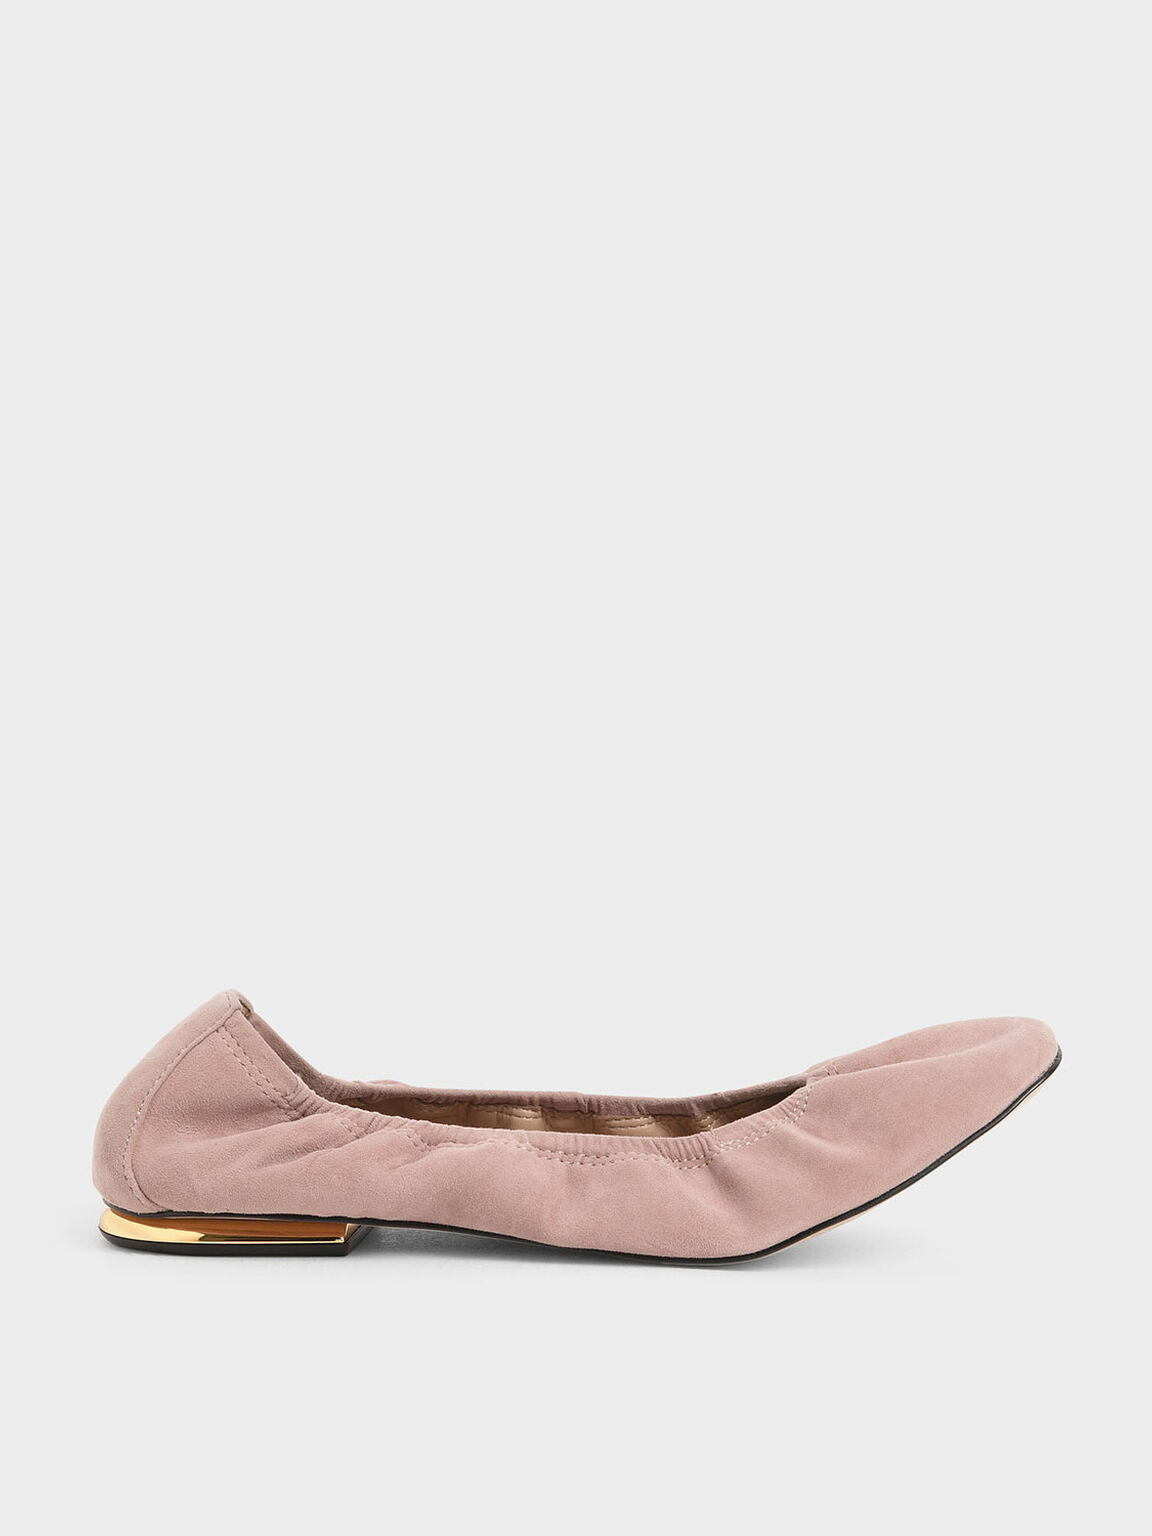 Ruched Ballerina Flats (Kid Suede), Blush, hi-res